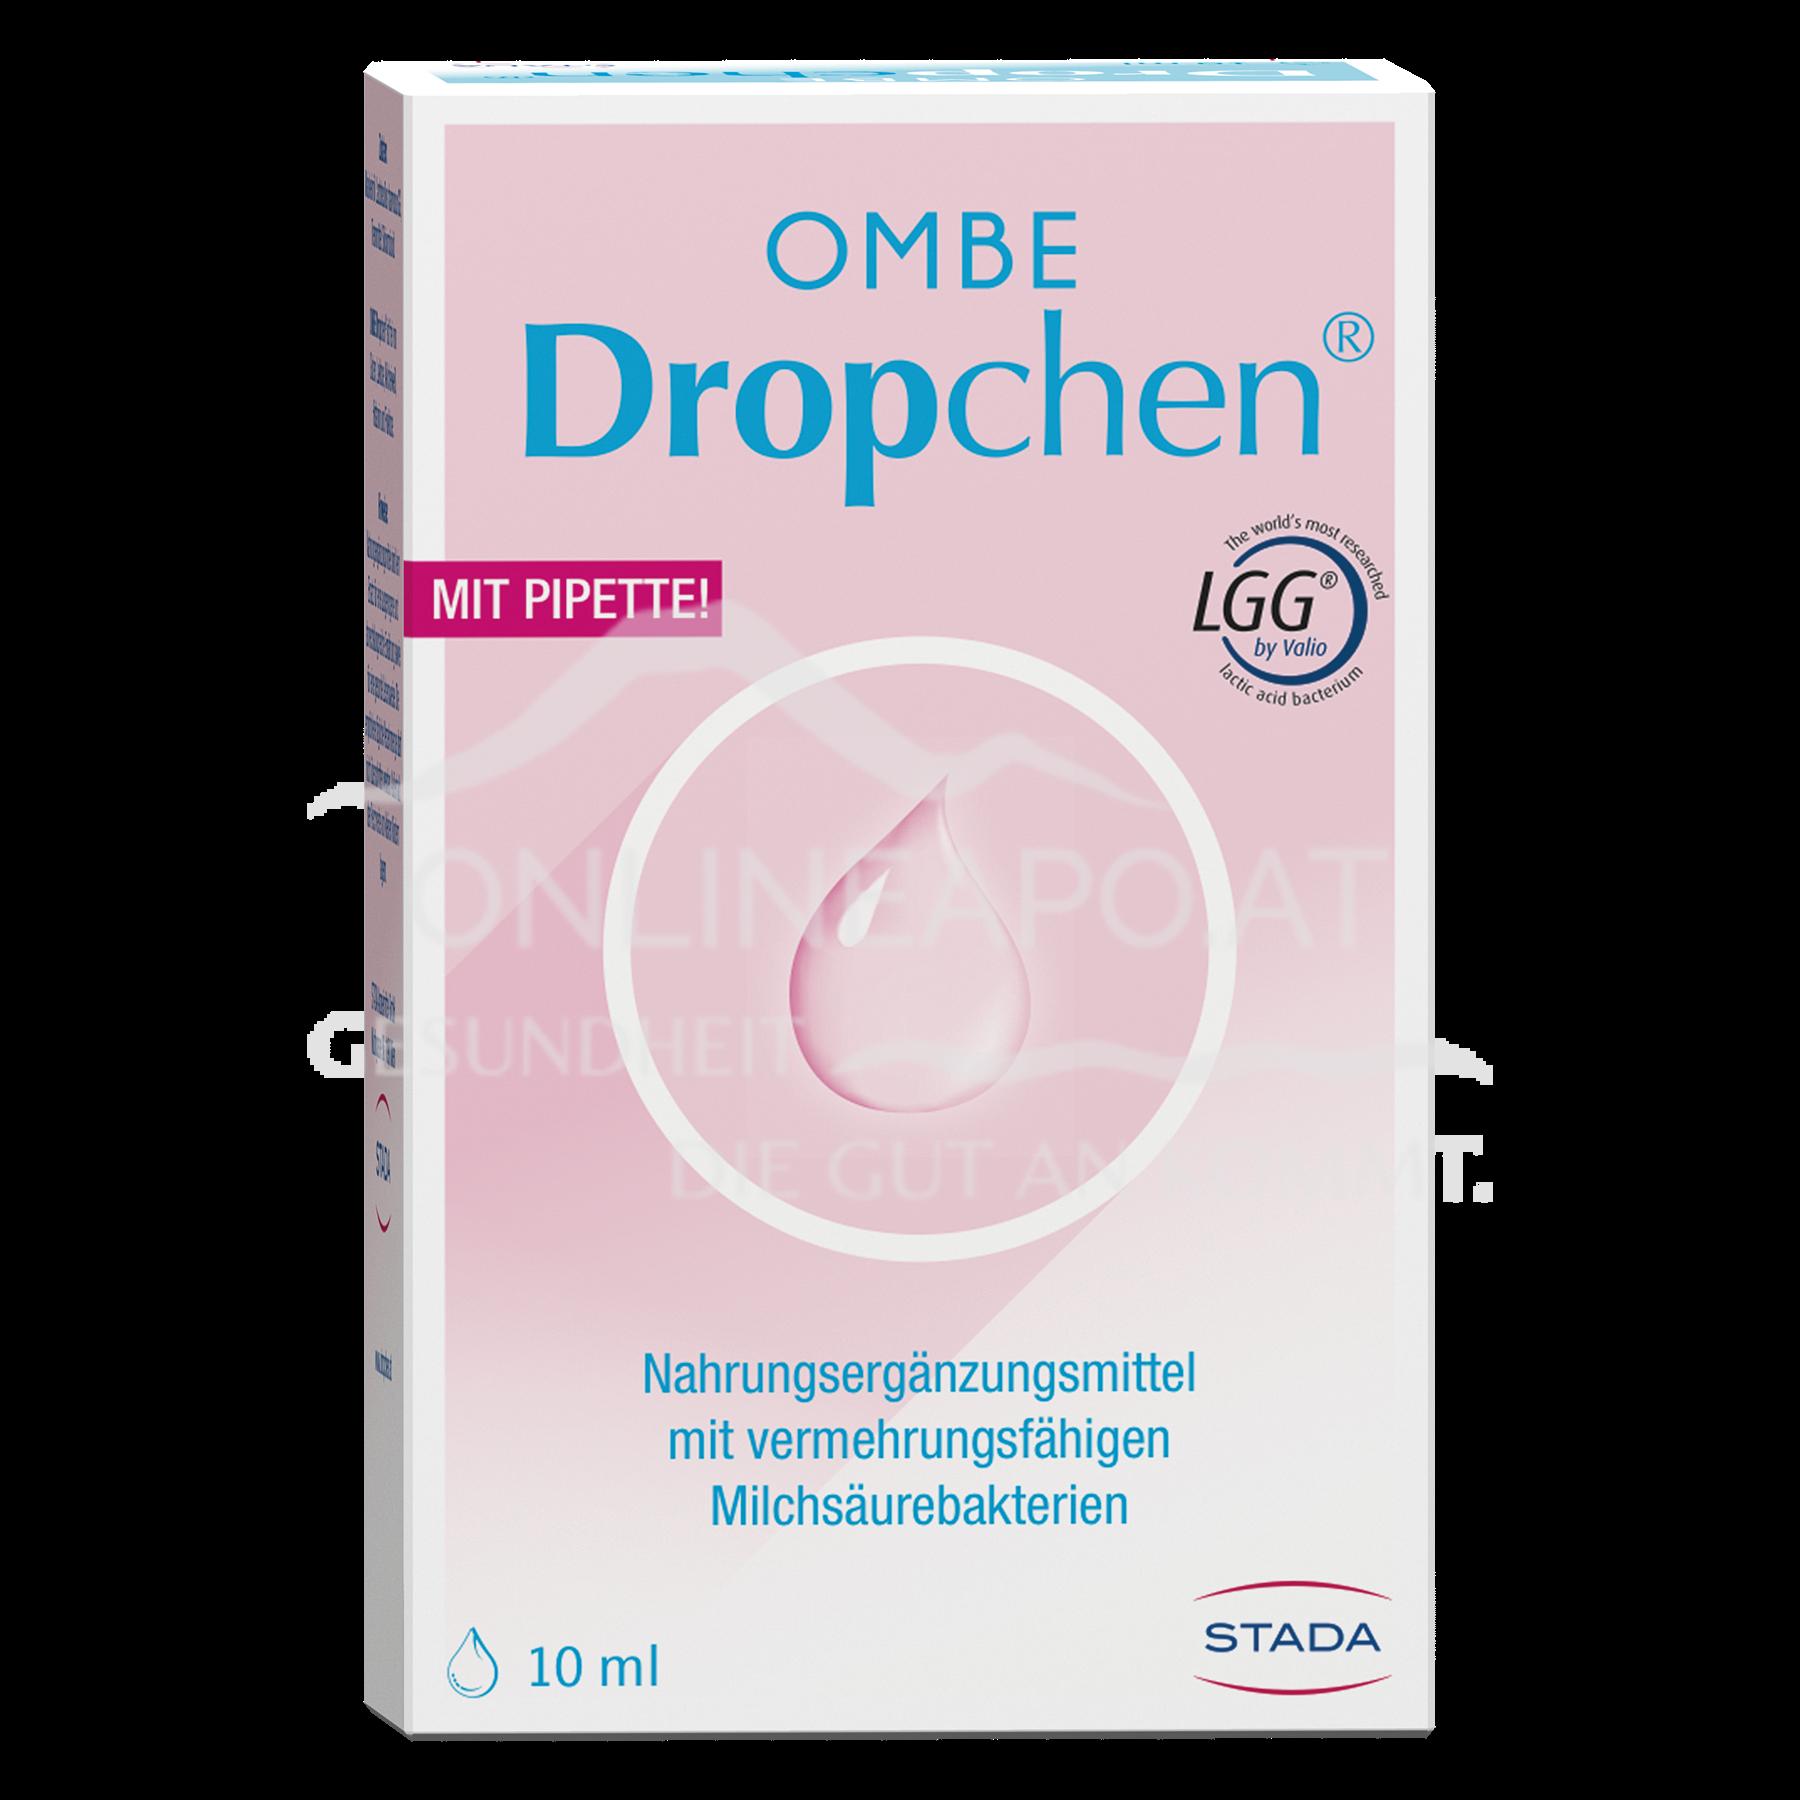 OMBE Dropchen®